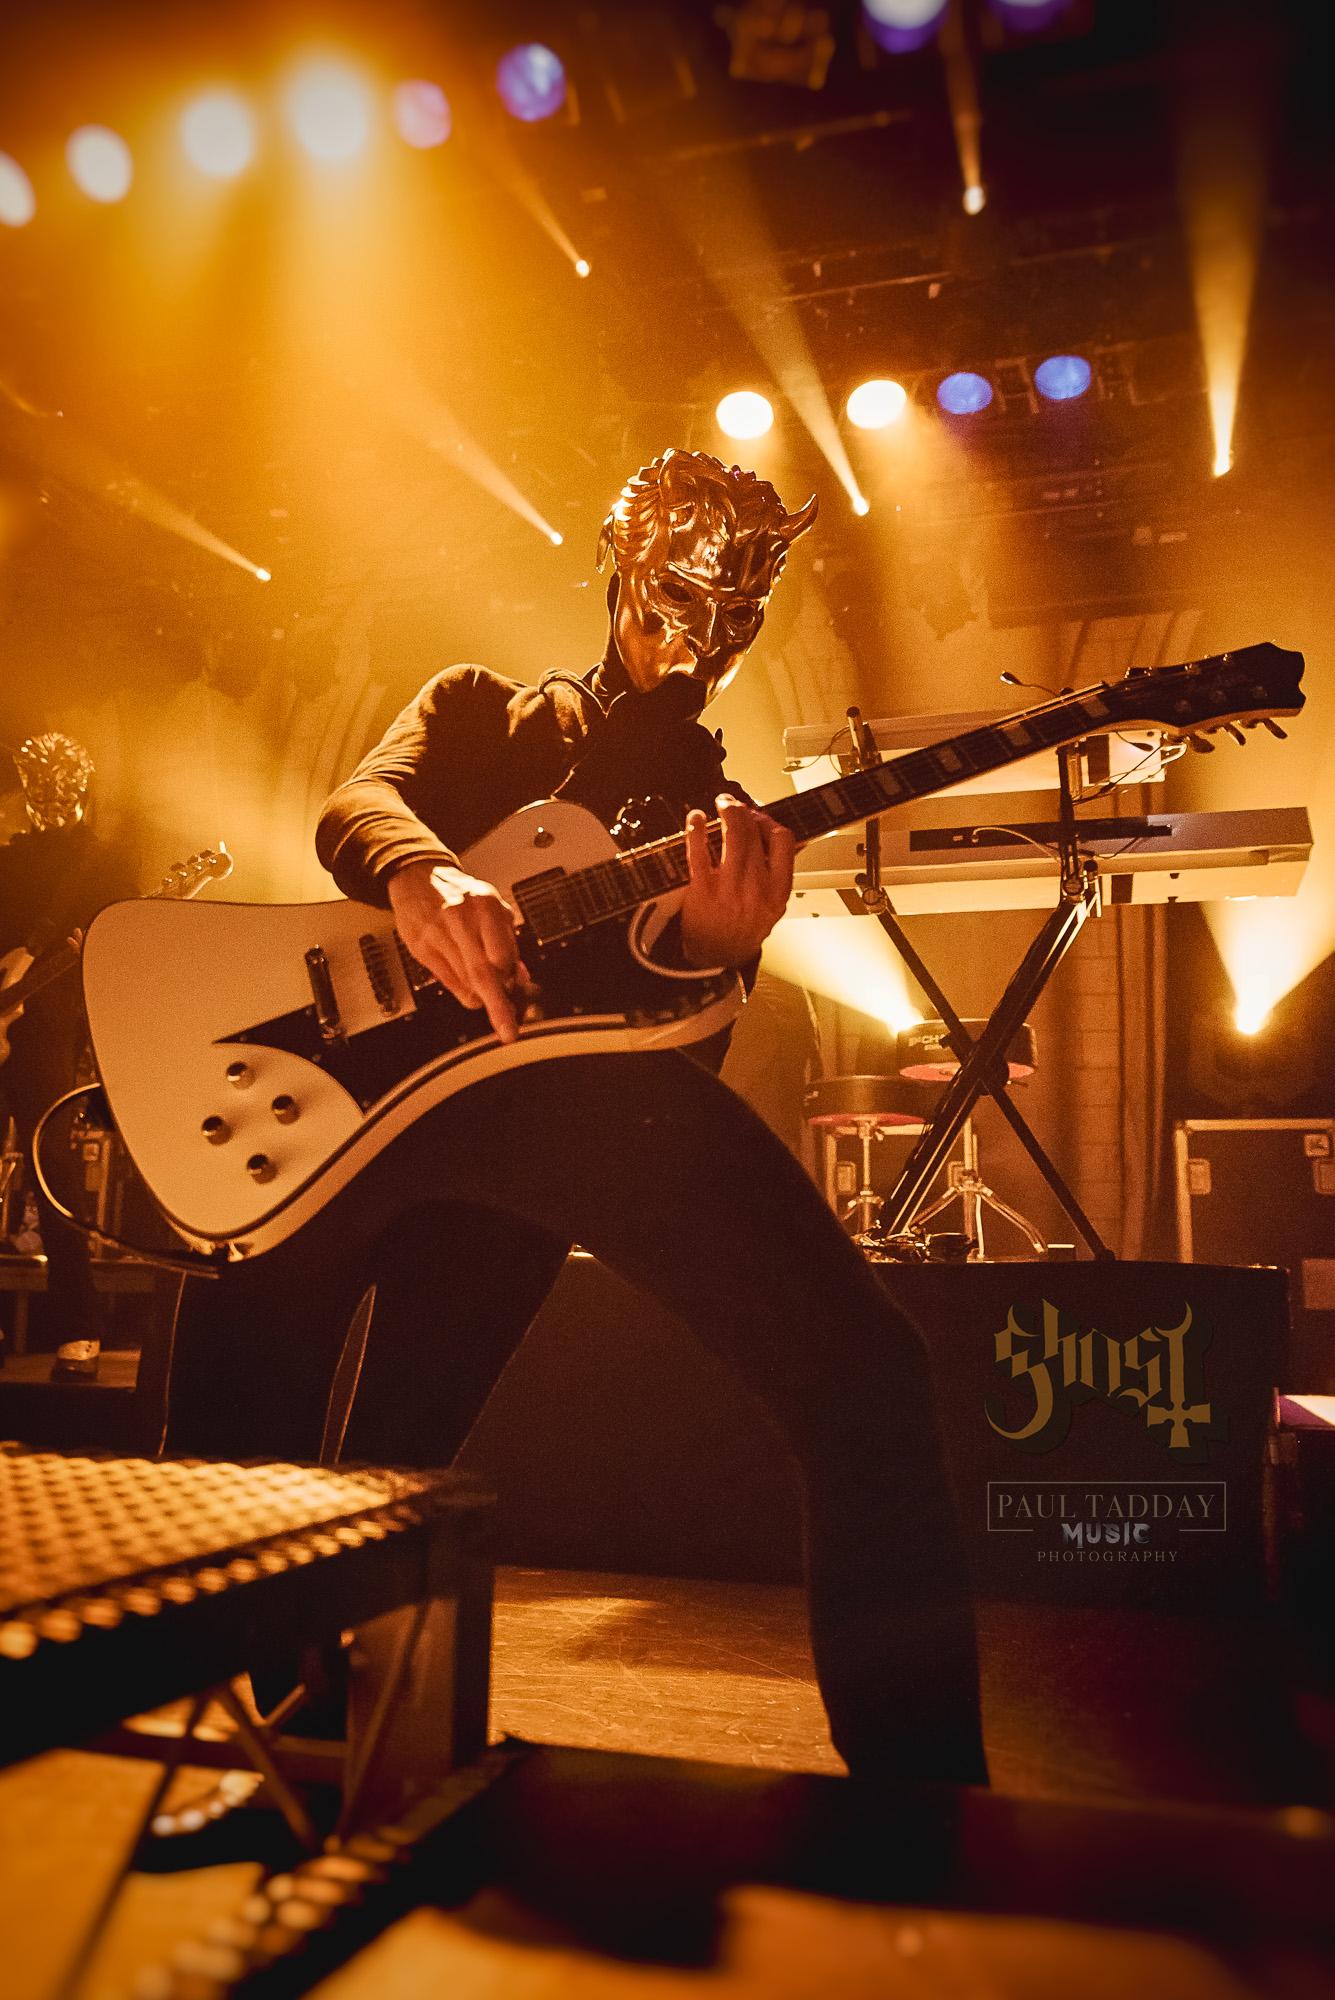 ghost-brisbane-download_2019-paul_tadday-web-12.jpg